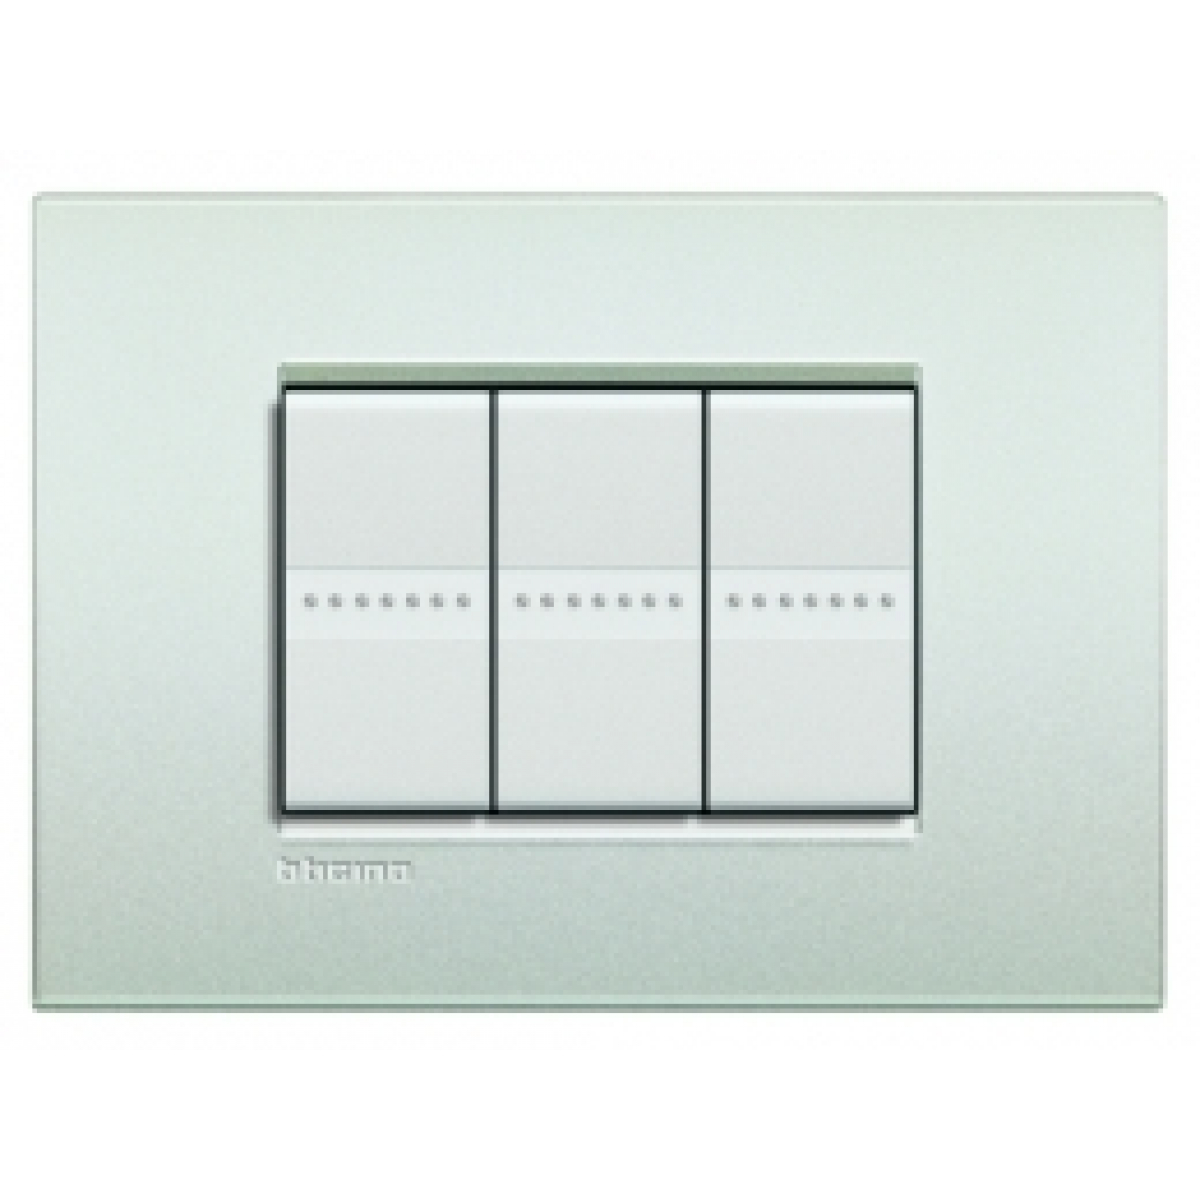 Placca 3 Moduli Bianco Perla Bticino Living Air LNC4803PR